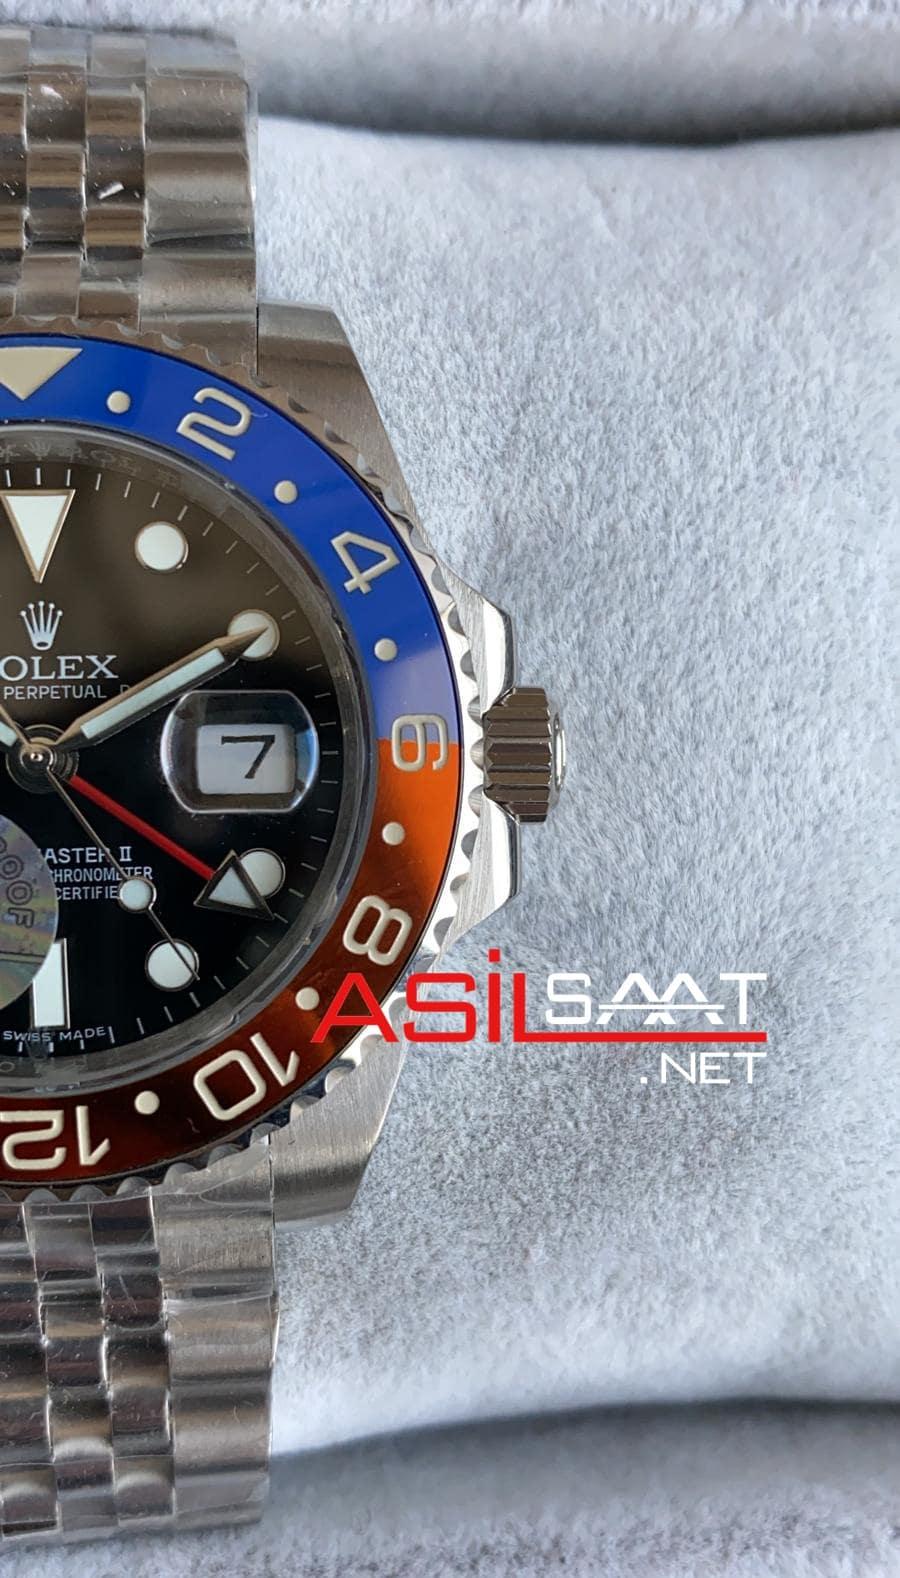 Rolex Jubilee Oyster Perpetual Gmt Master II Pepsi Silver Replika Saat ROLG010q